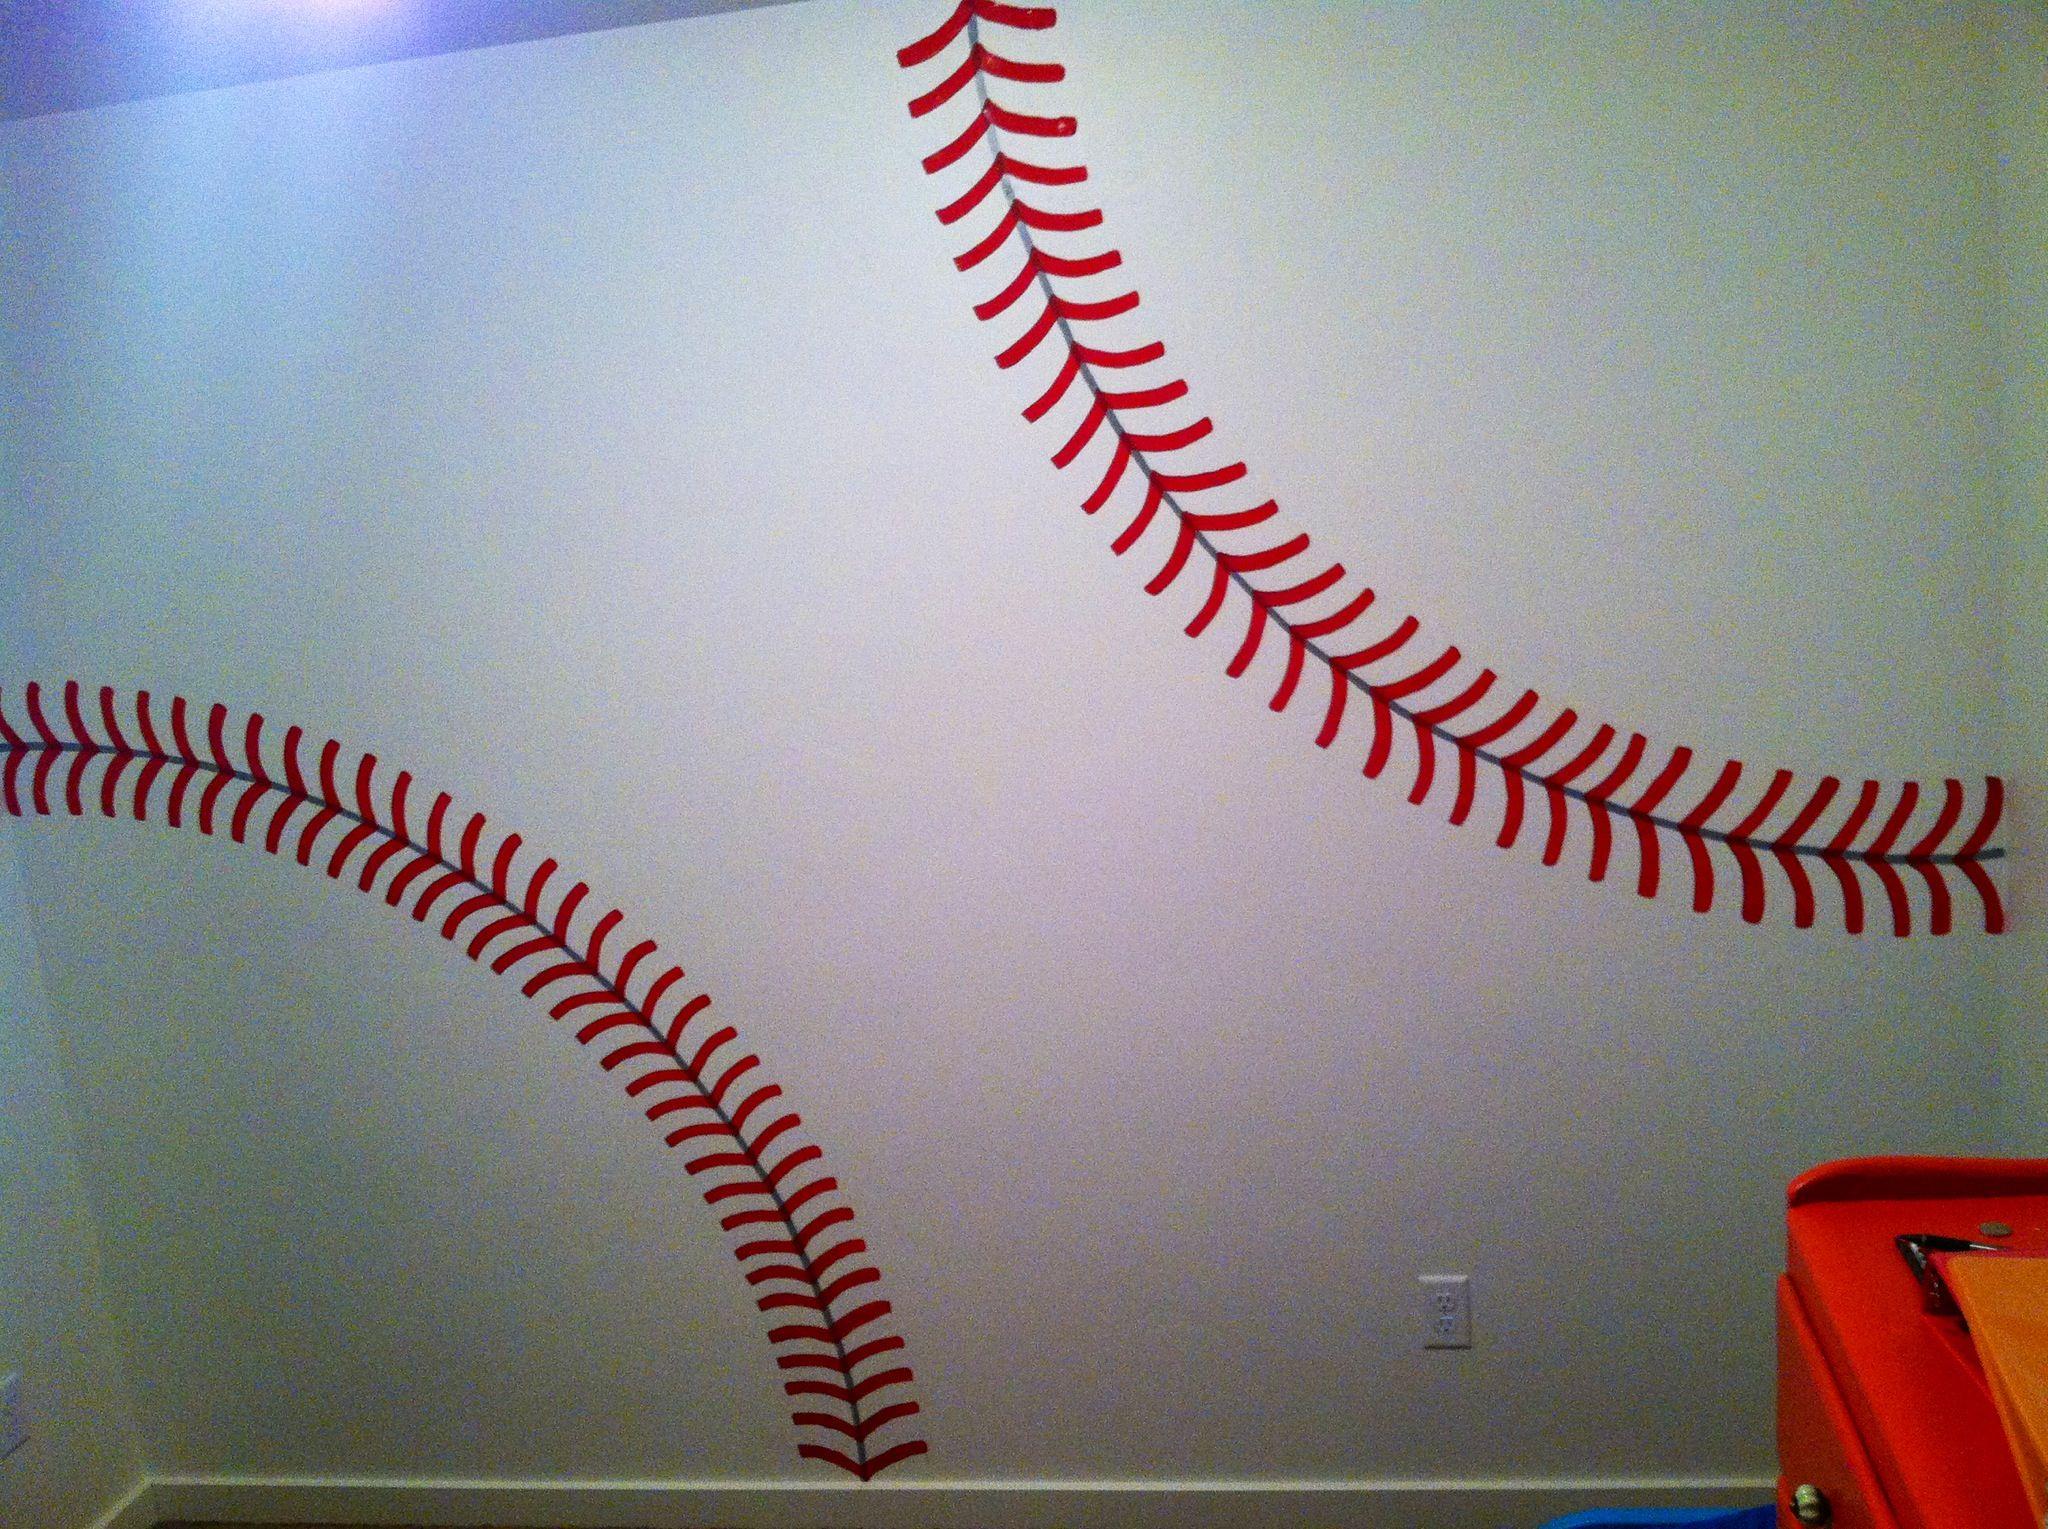 baseball wall for kids room kid s room pinterest baseball baseball wall for kids room